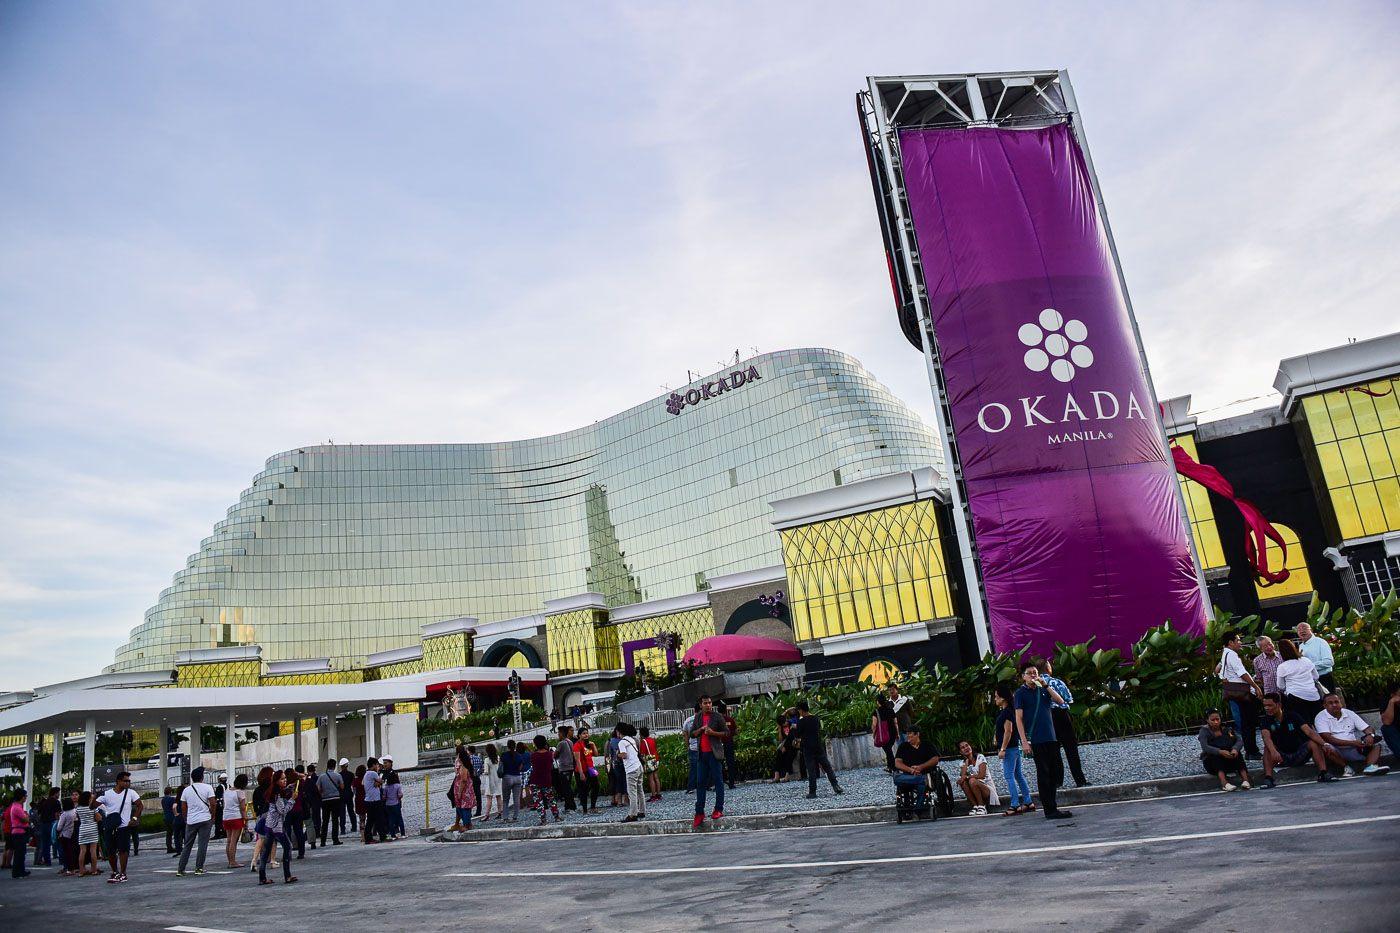 Okada Philippines